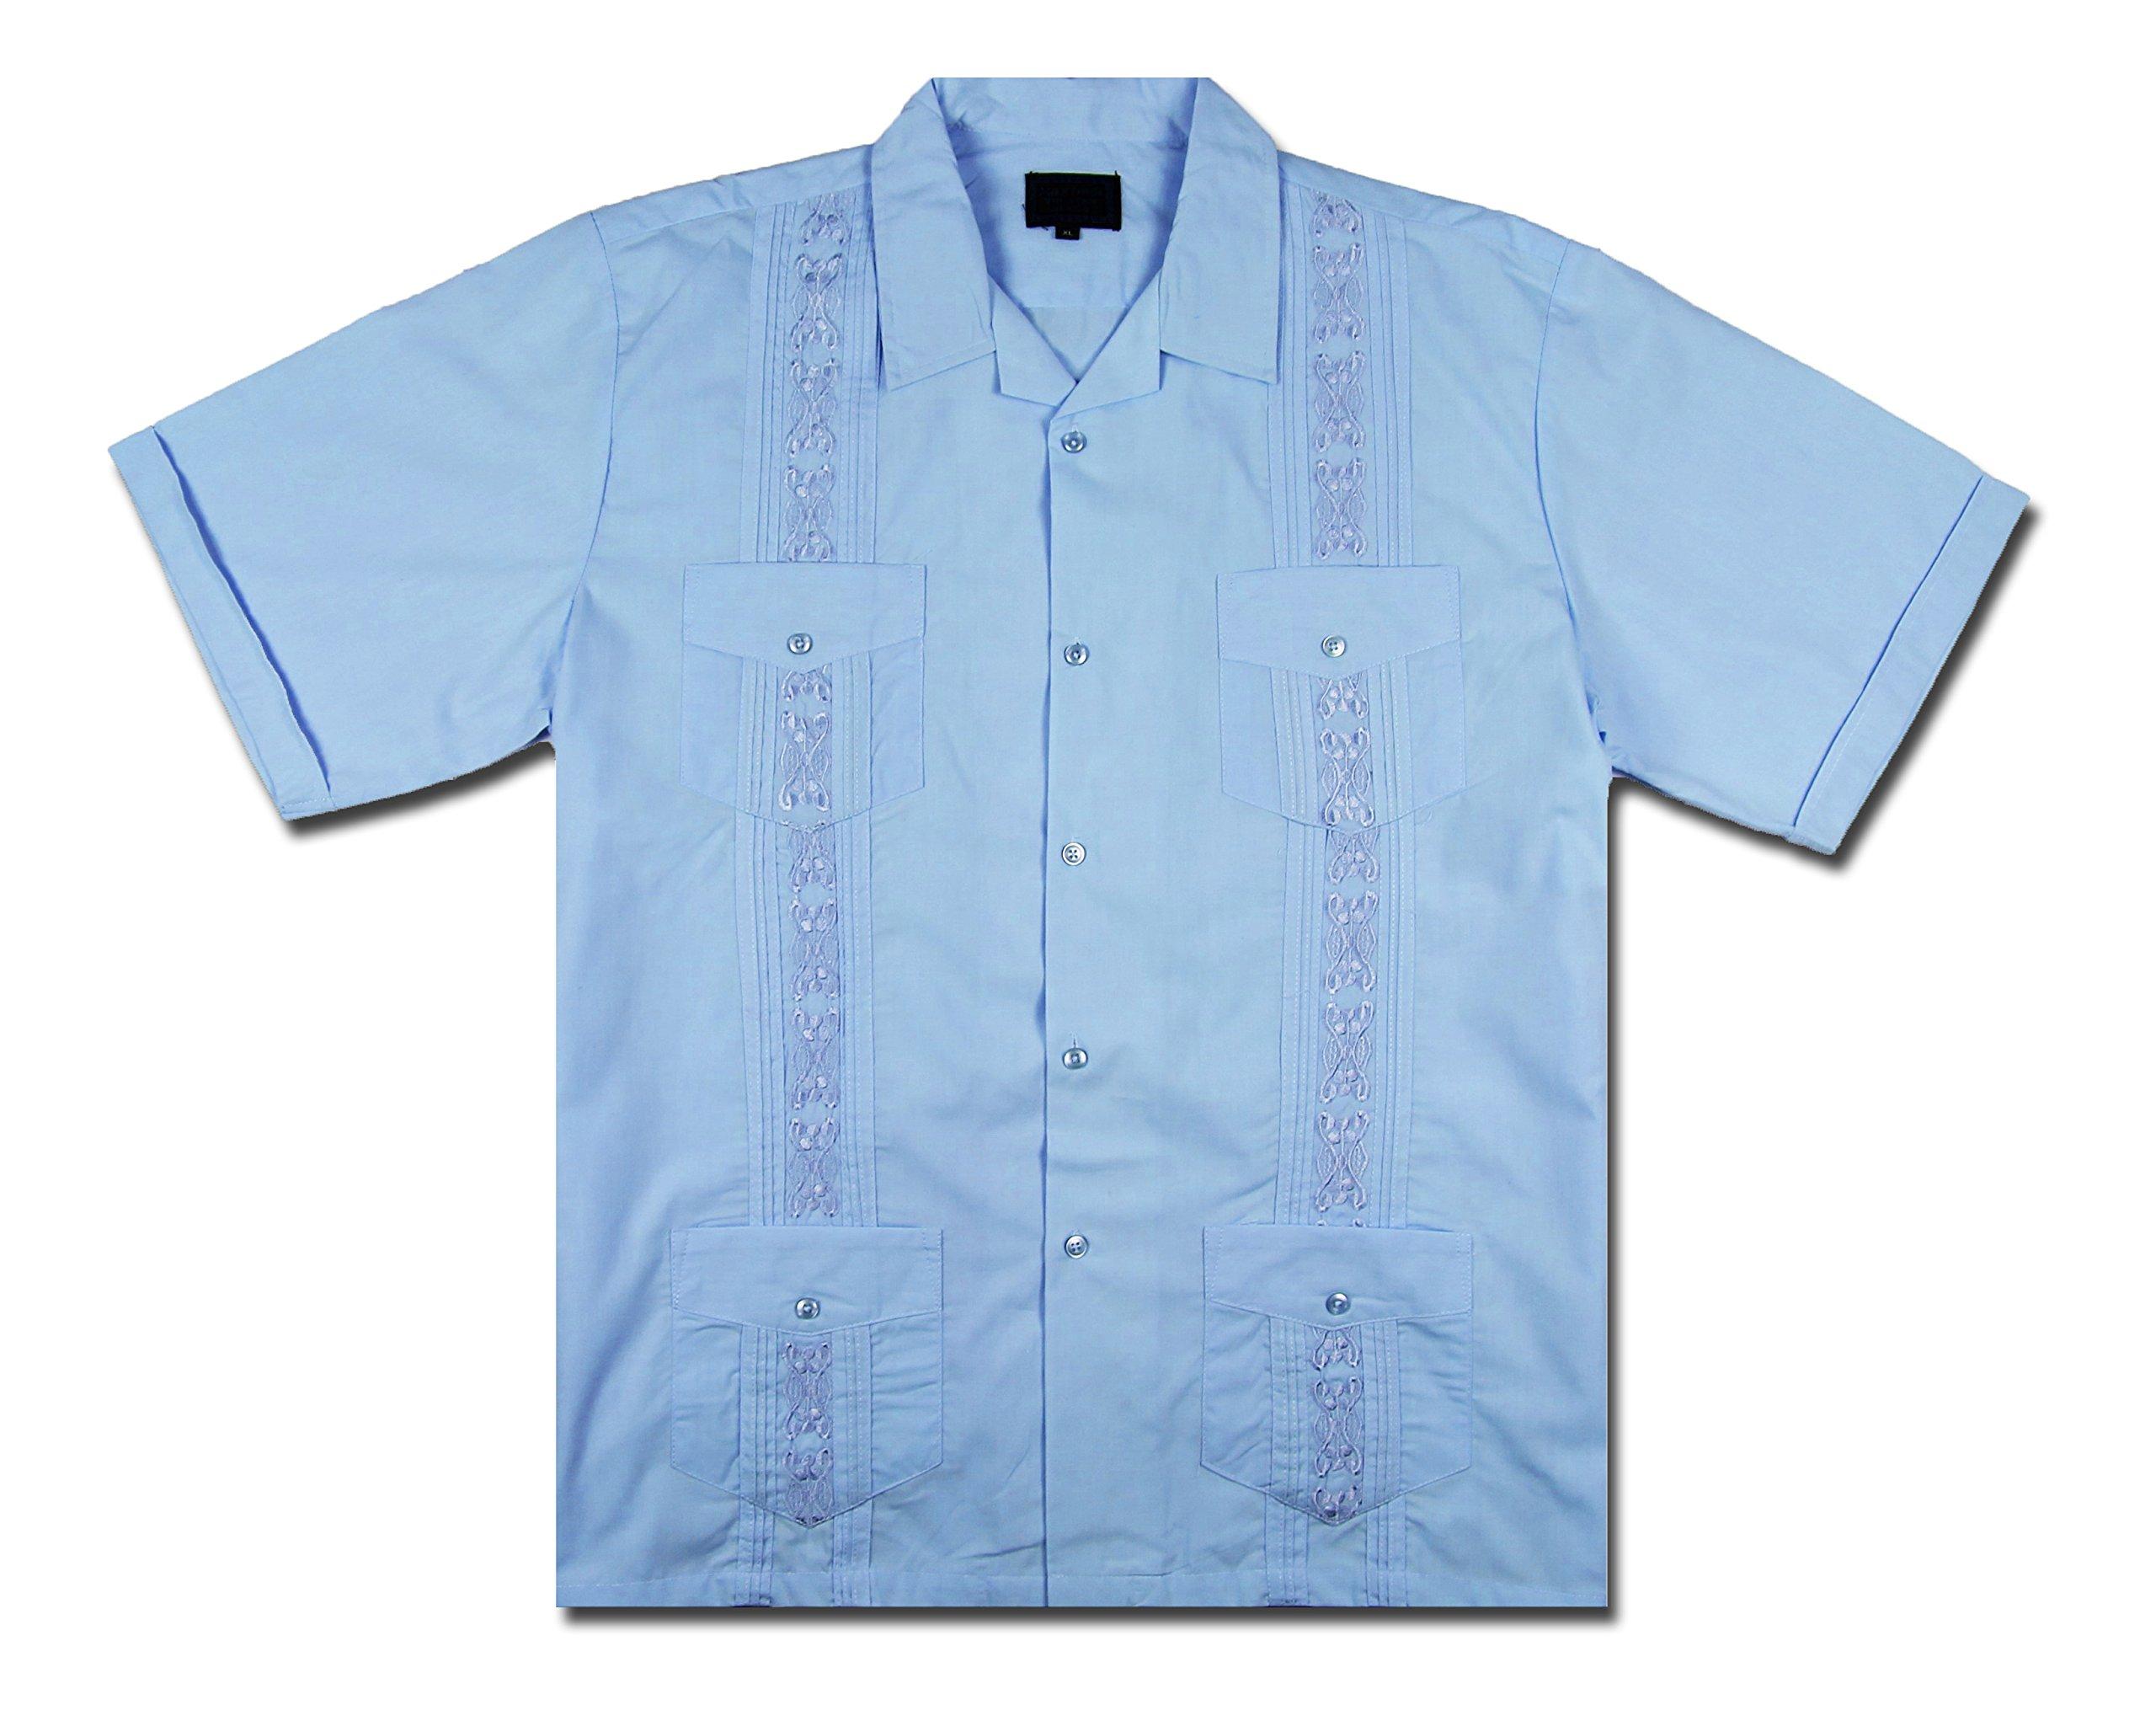 Maximos by R & B New Guayabera Kids Boys Cuban Latino Style Wedding Button Down Dress Shirt (8, Light Blue)